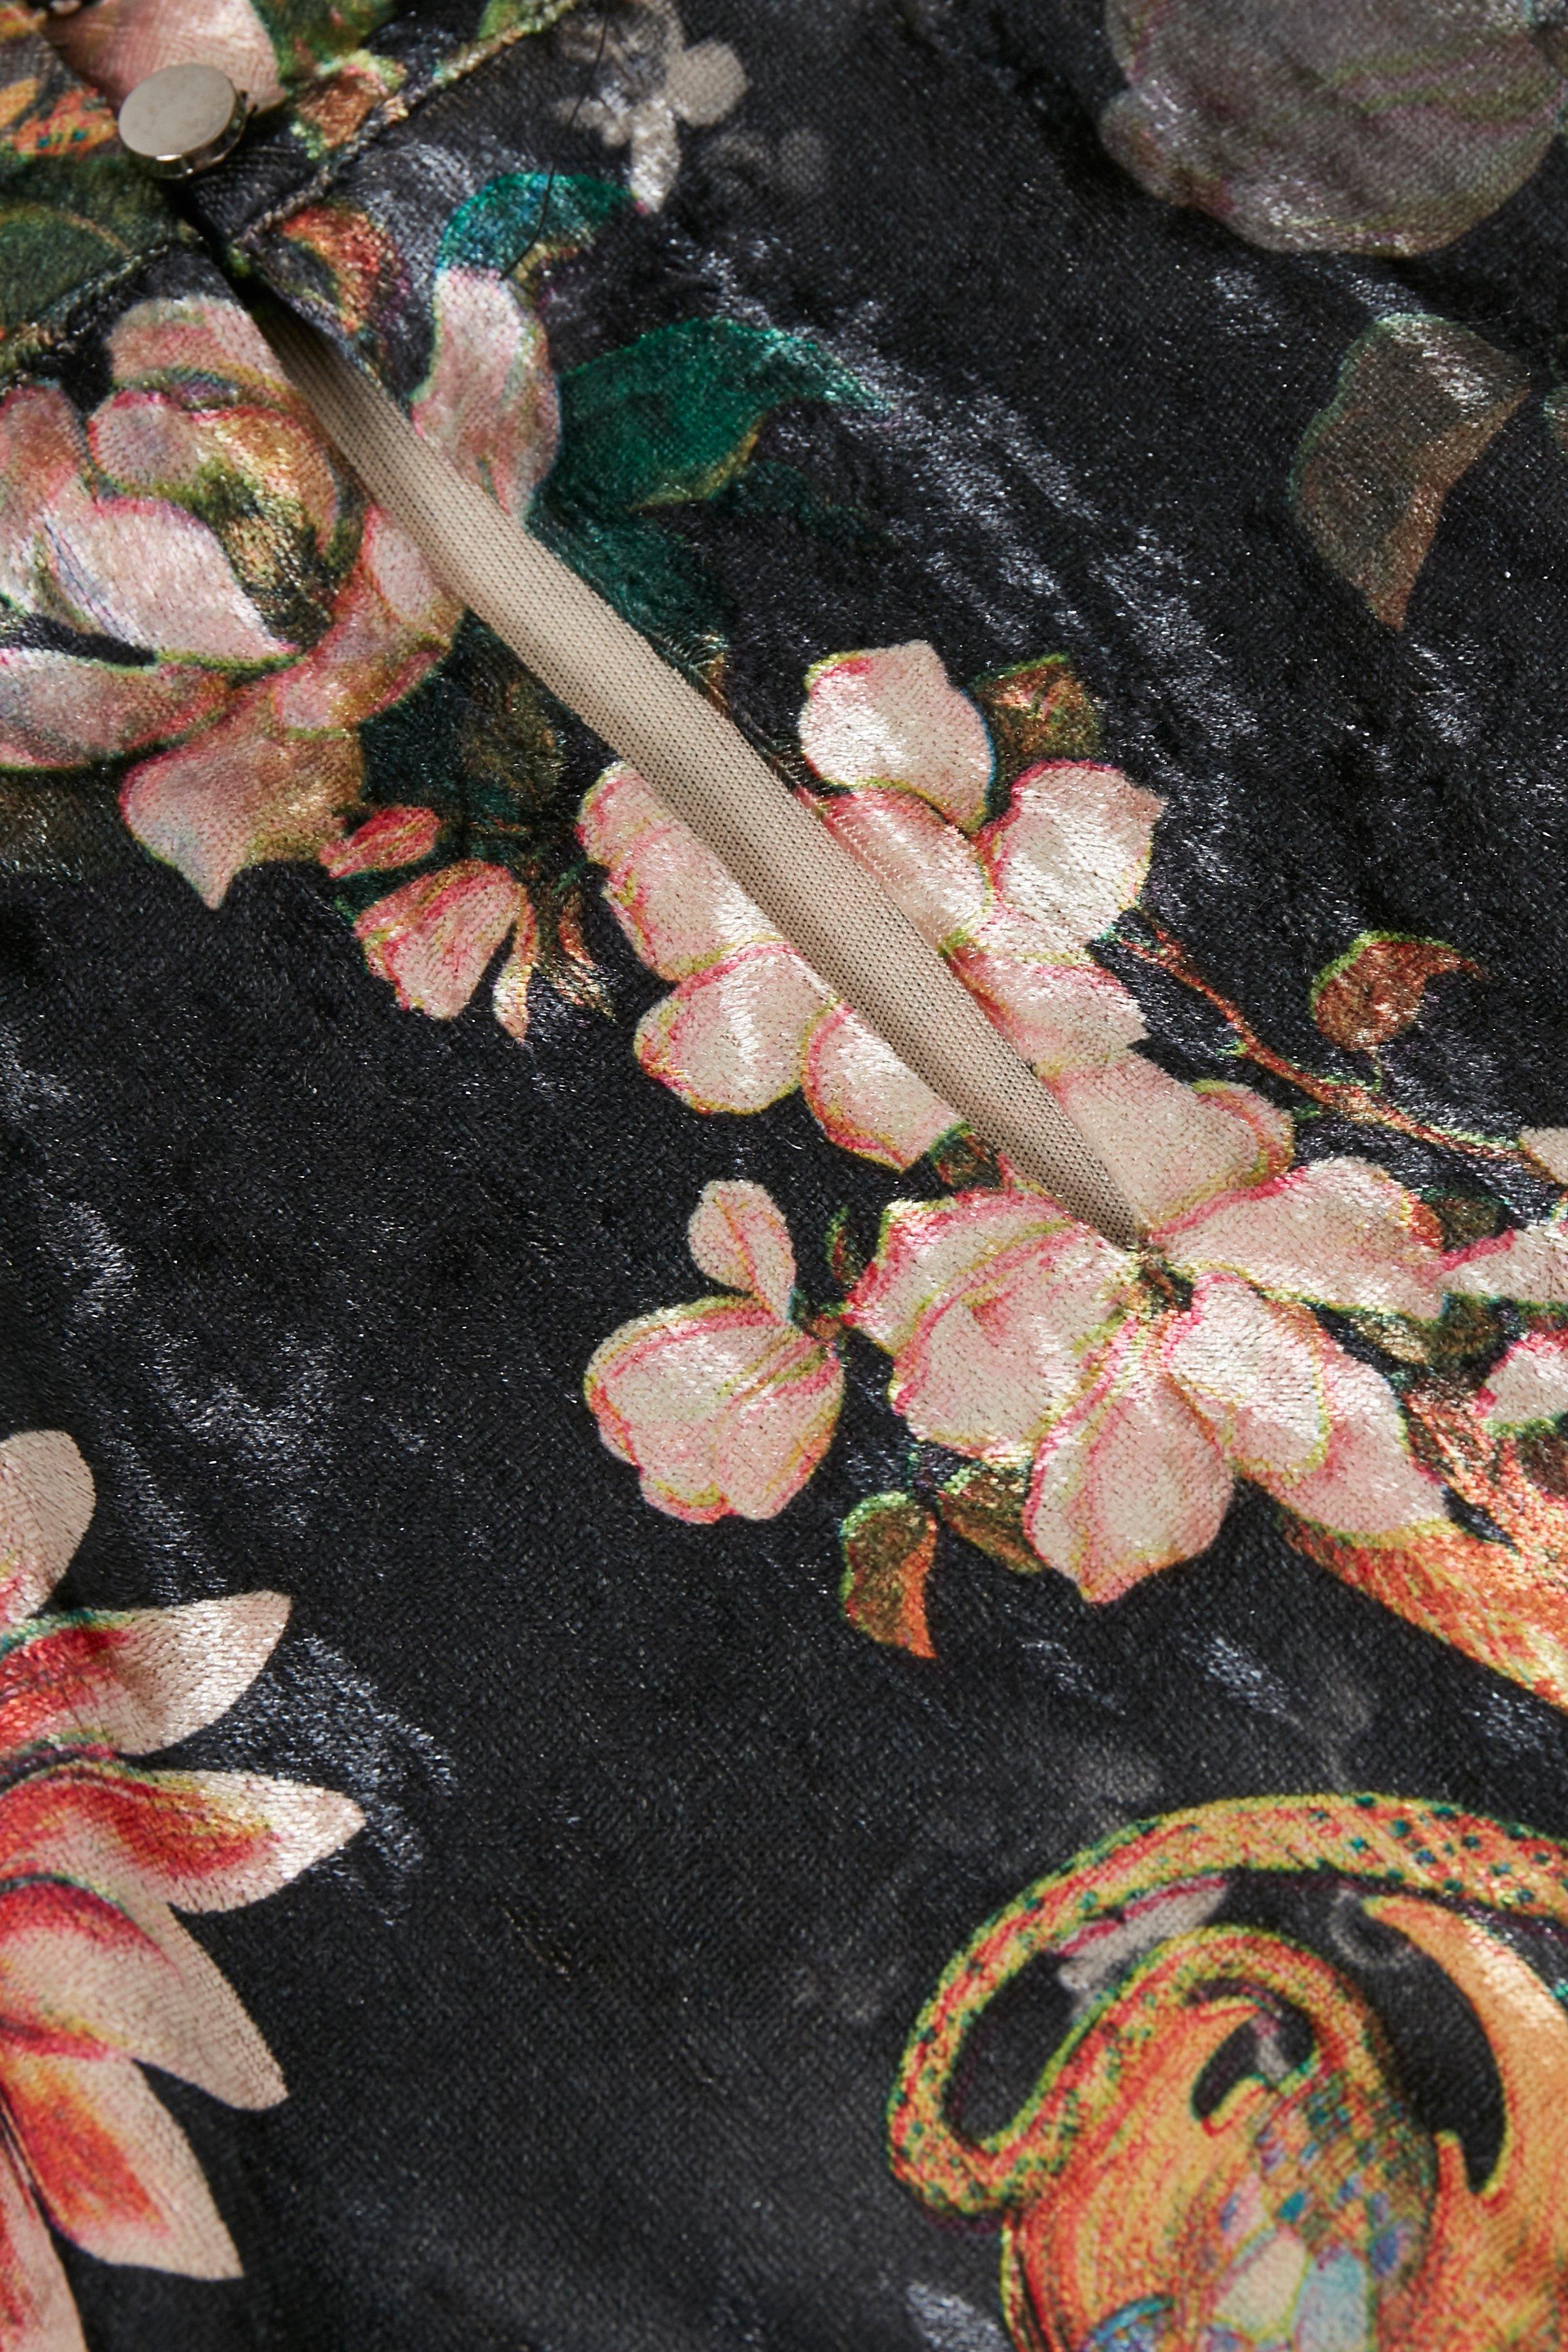 Zwart/roze Blouse met lange mouwen van Kaffe – Door Zwart/roze Blouse met lange mouwen van maat. XS-XXL hier